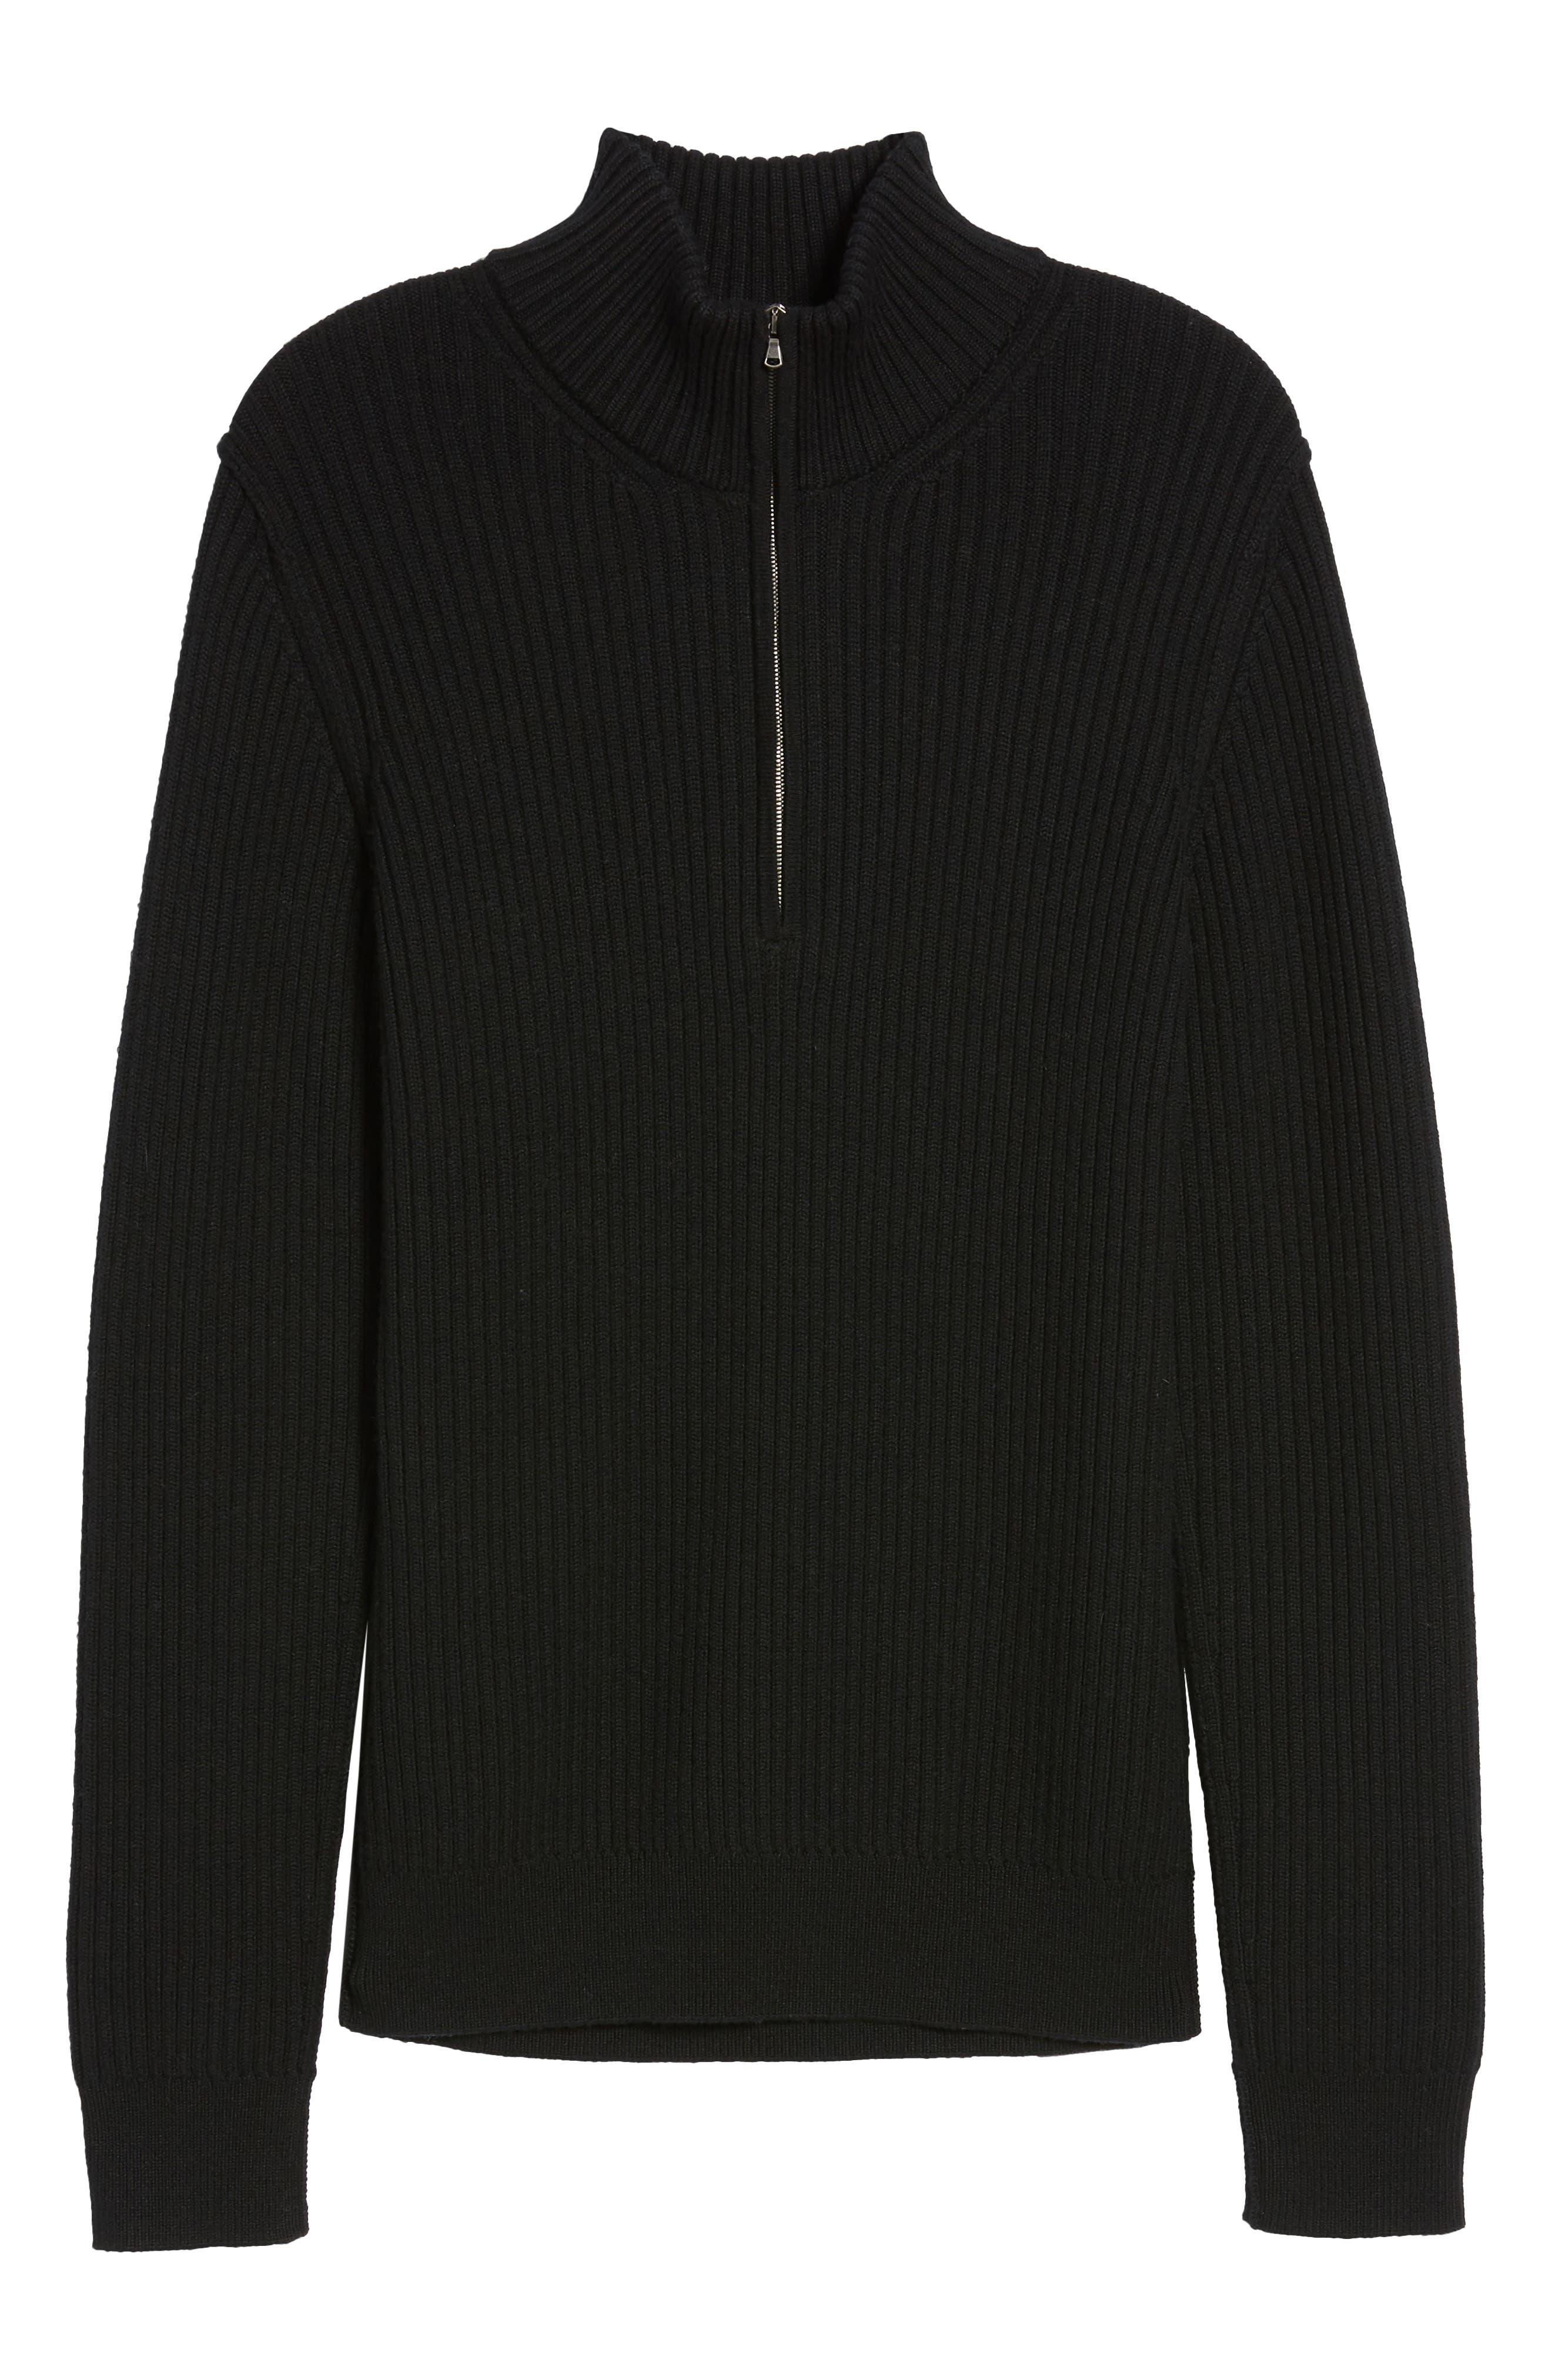 Ribbed Quarter Zip Mock Neck Sweater,                             Alternate thumbnail 5, color,                             Black